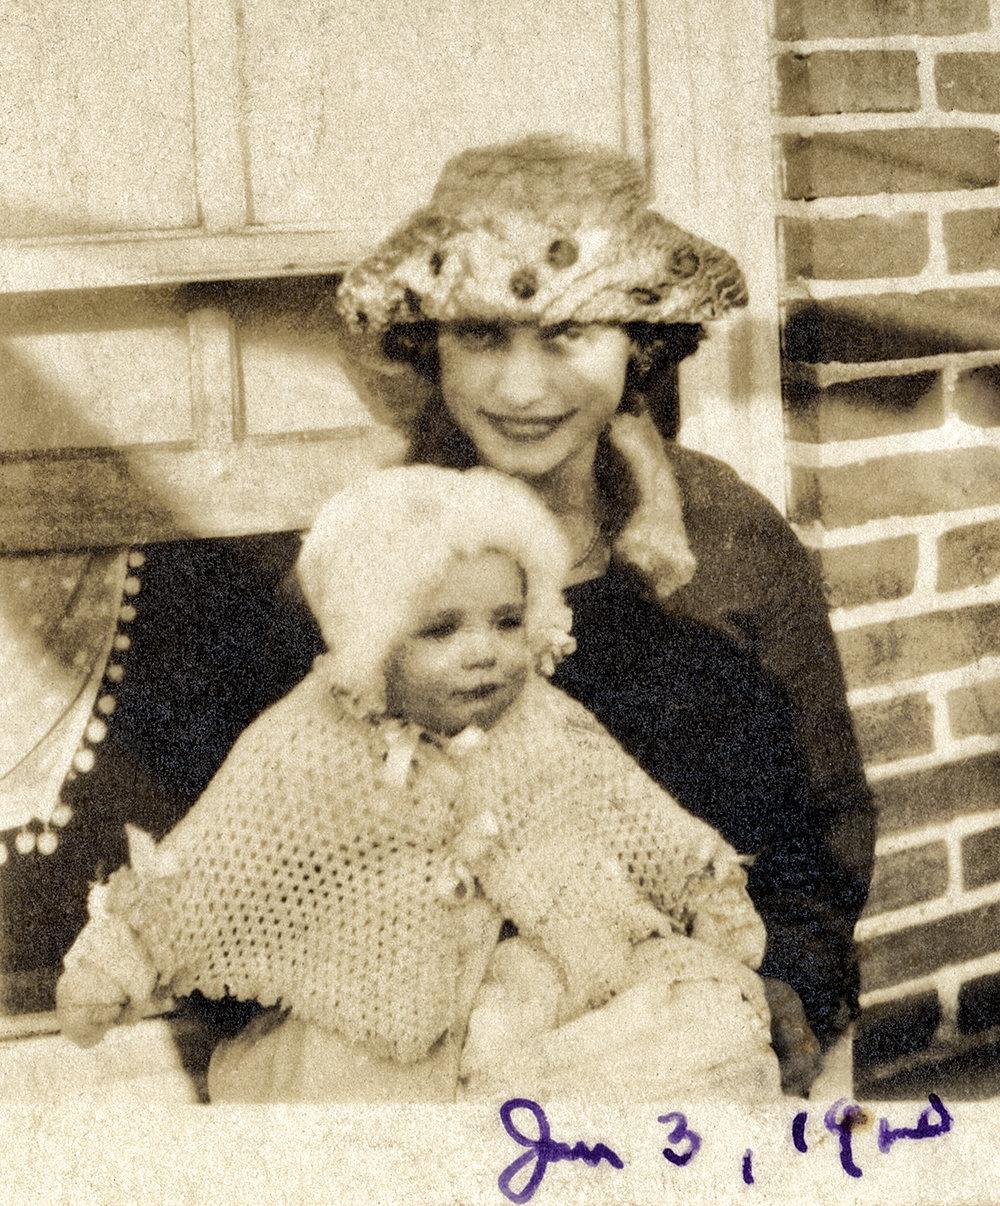 Goodwin - Doug 1920 (2).jpg